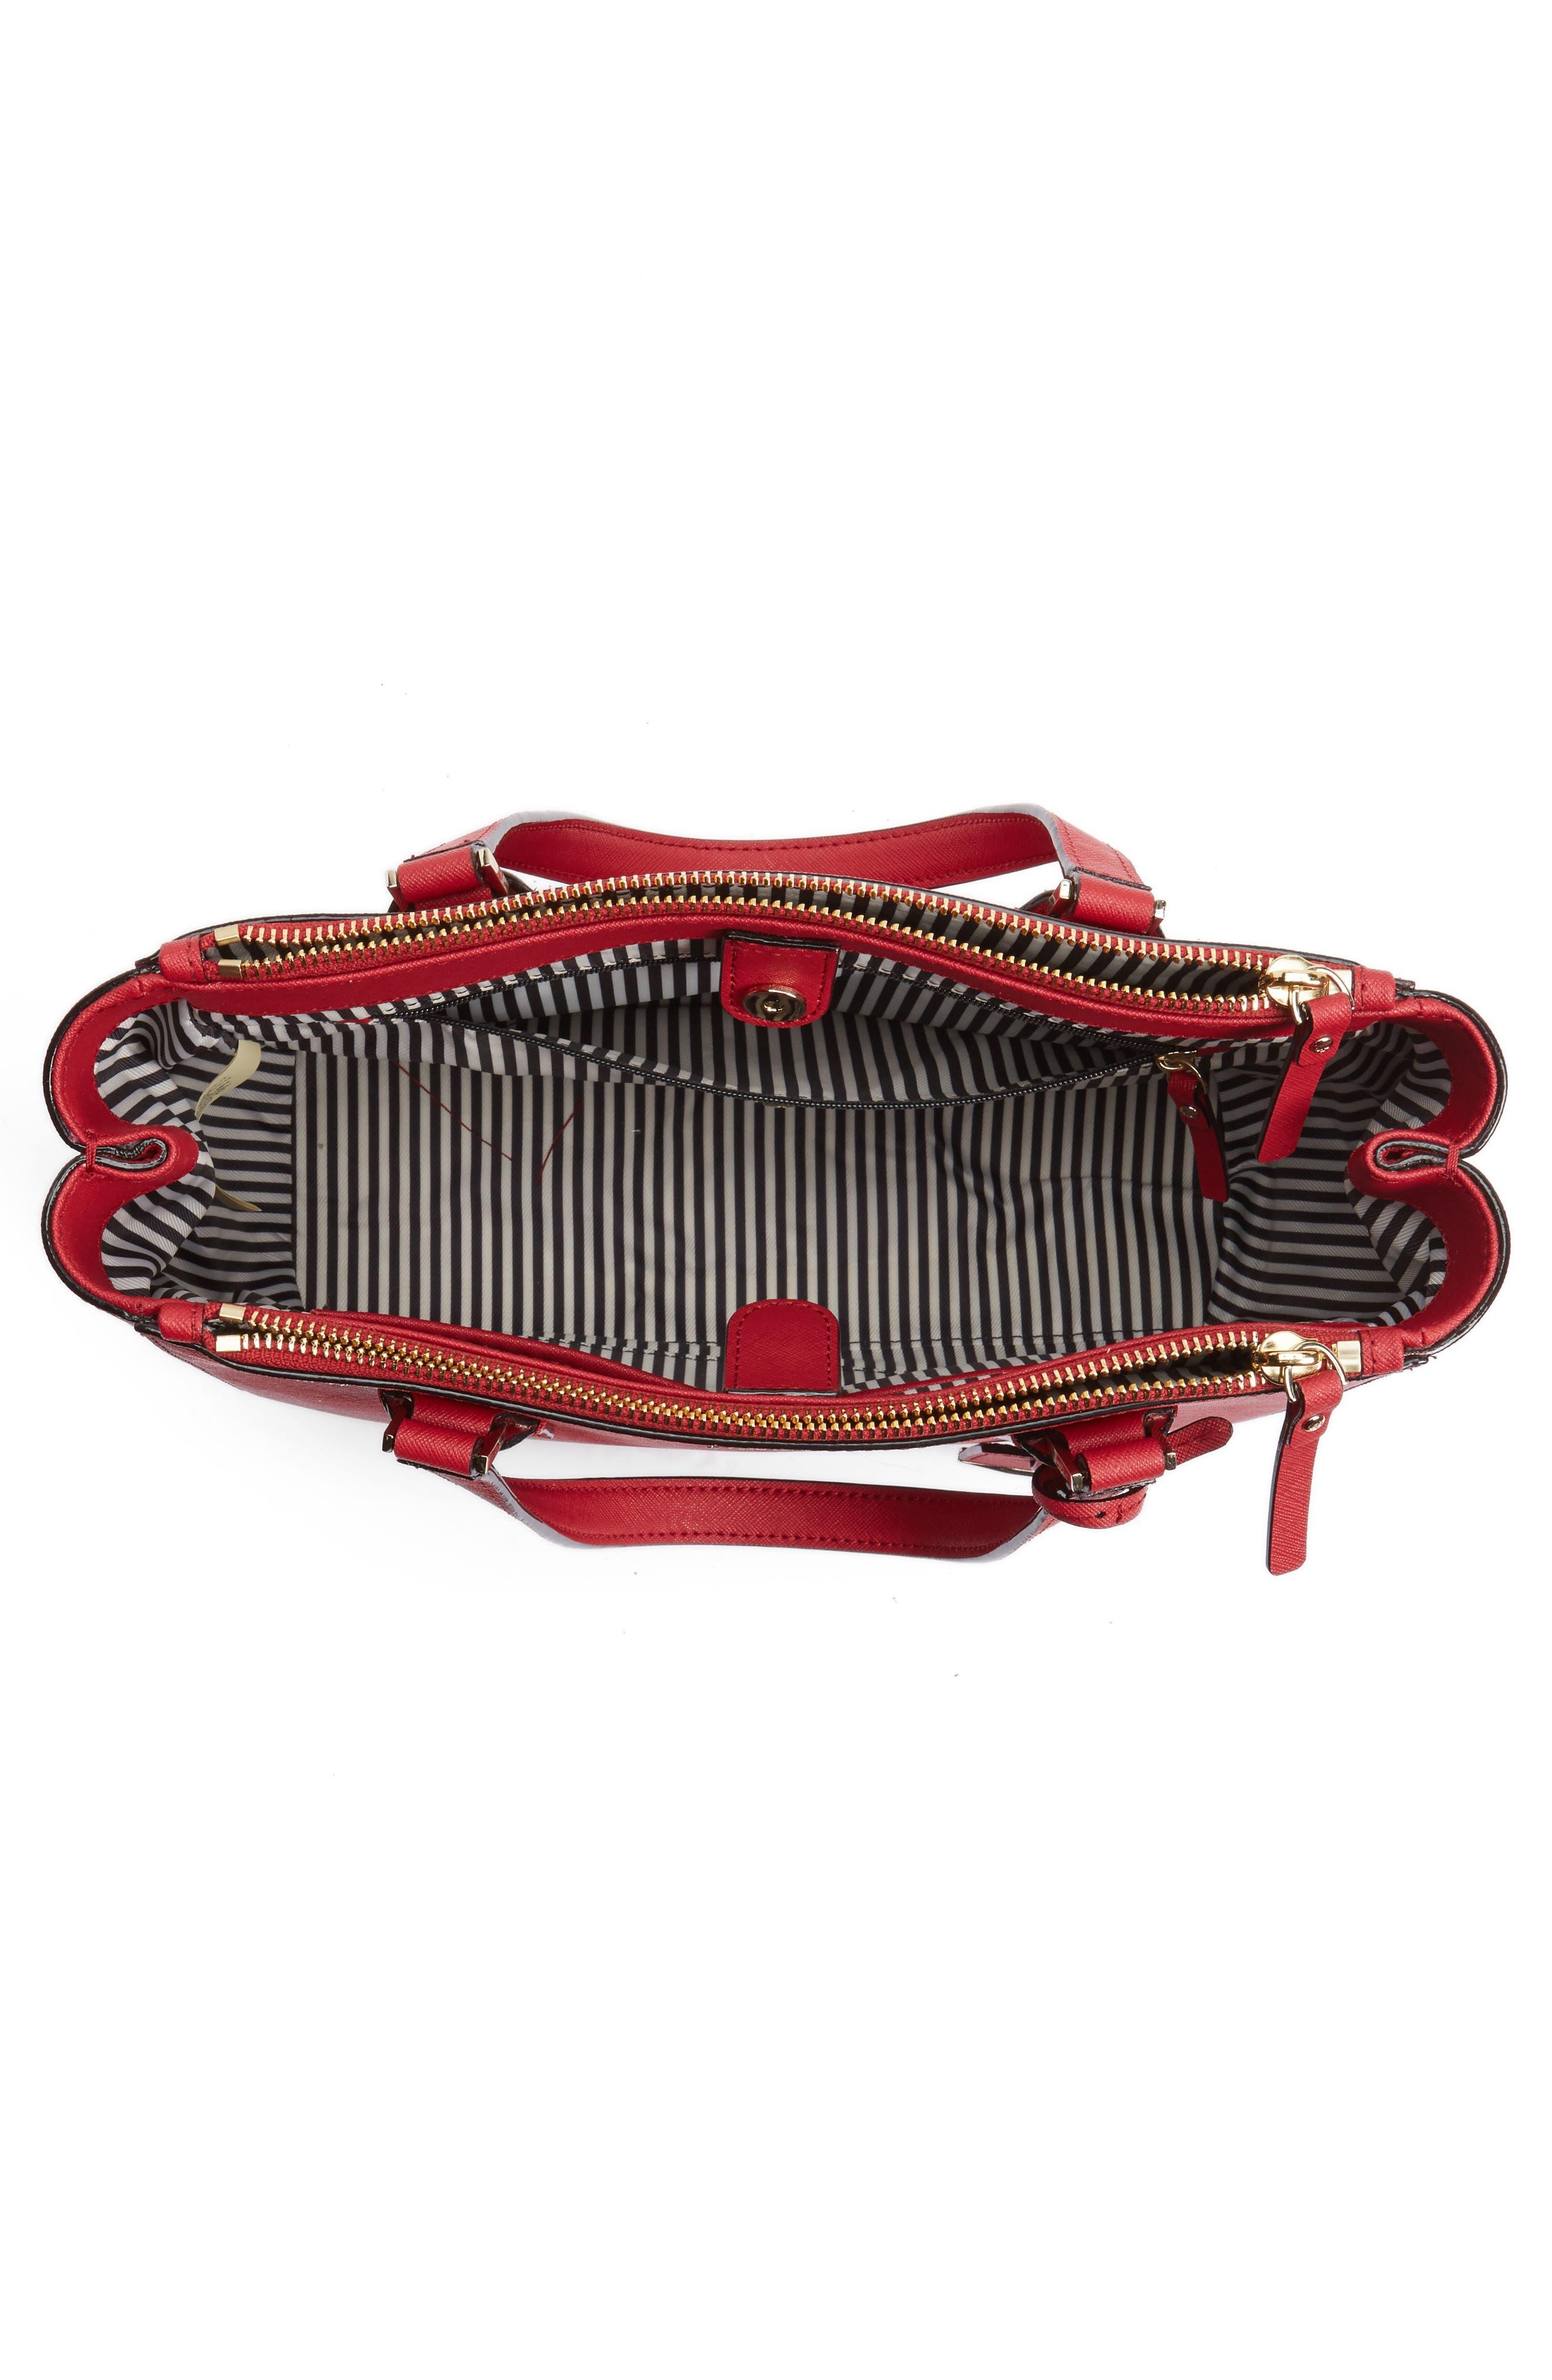 cameron street - teegan calfskin leather satchel,                             Alternate thumbnail 4, color,                             638